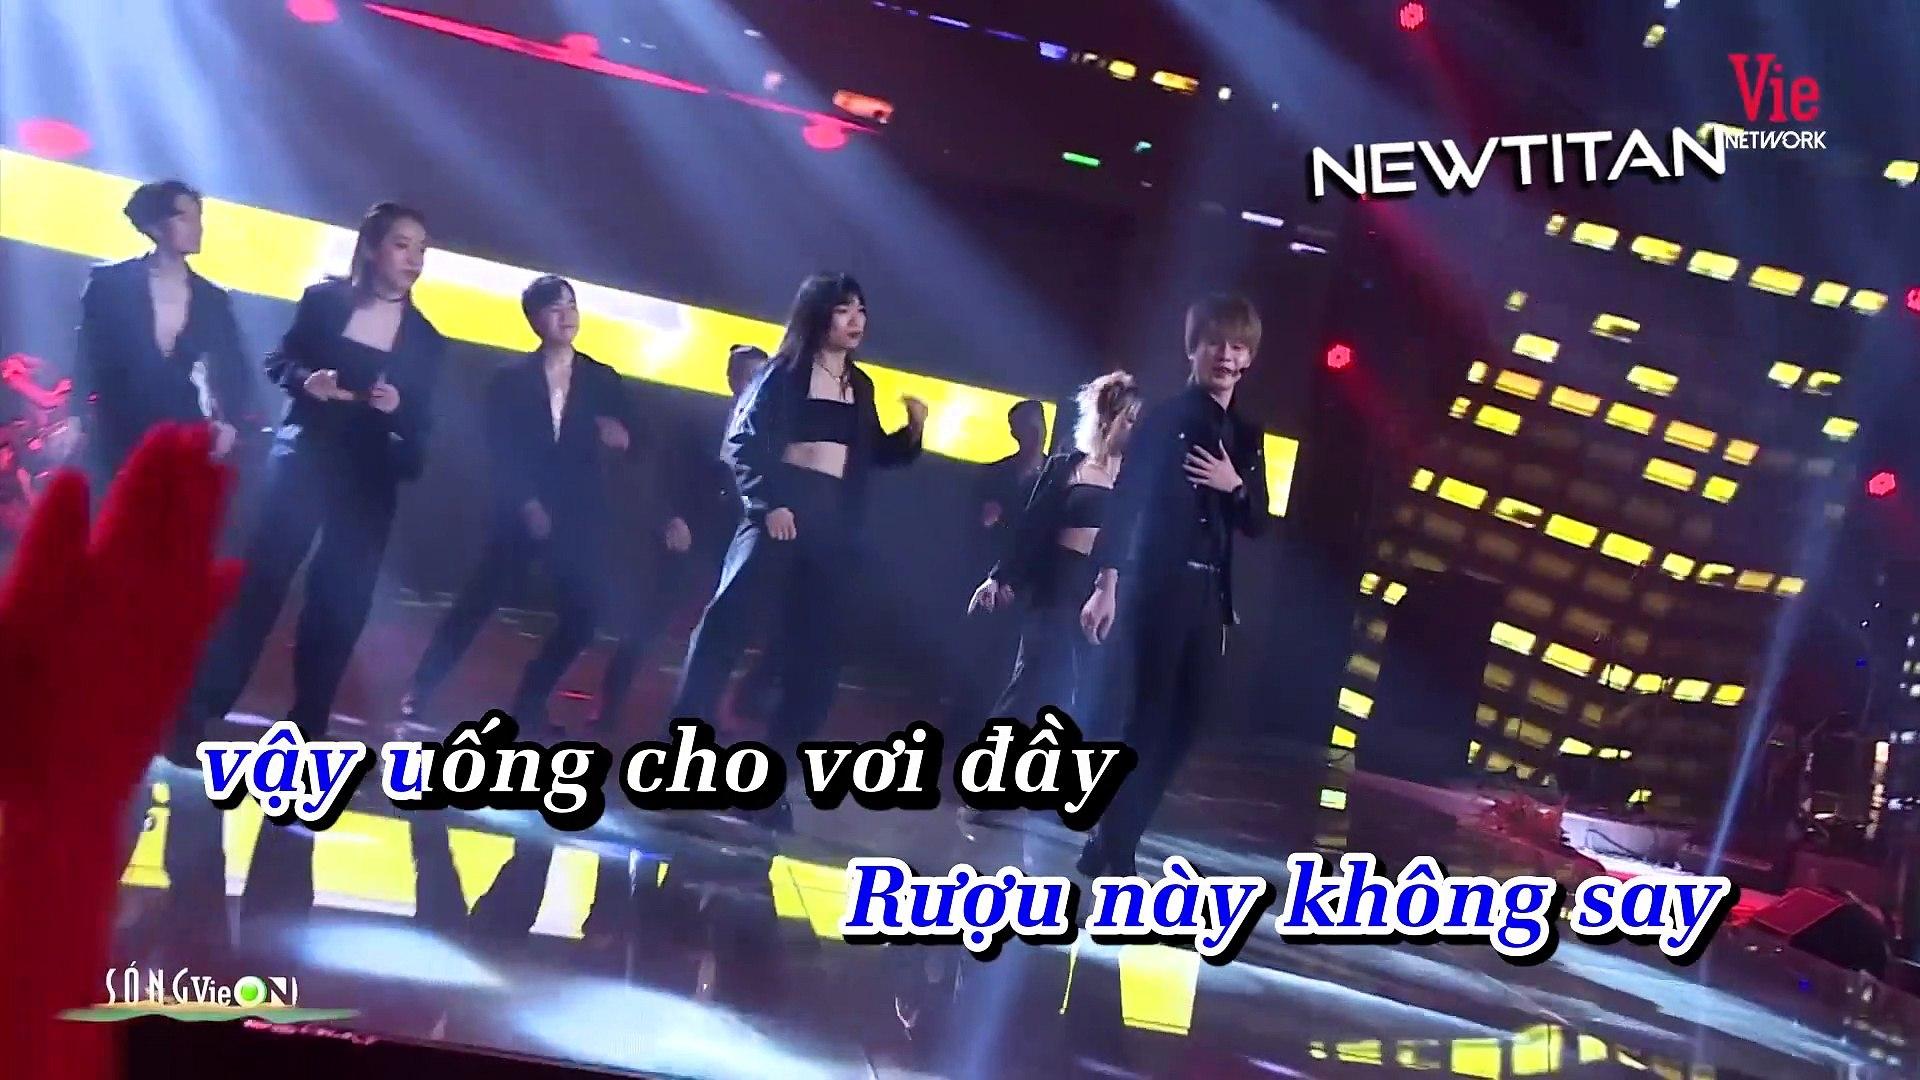 [Karaoke] Là Một Thằng Con Trai (New Version) - Jack [Beat] | Live VieON